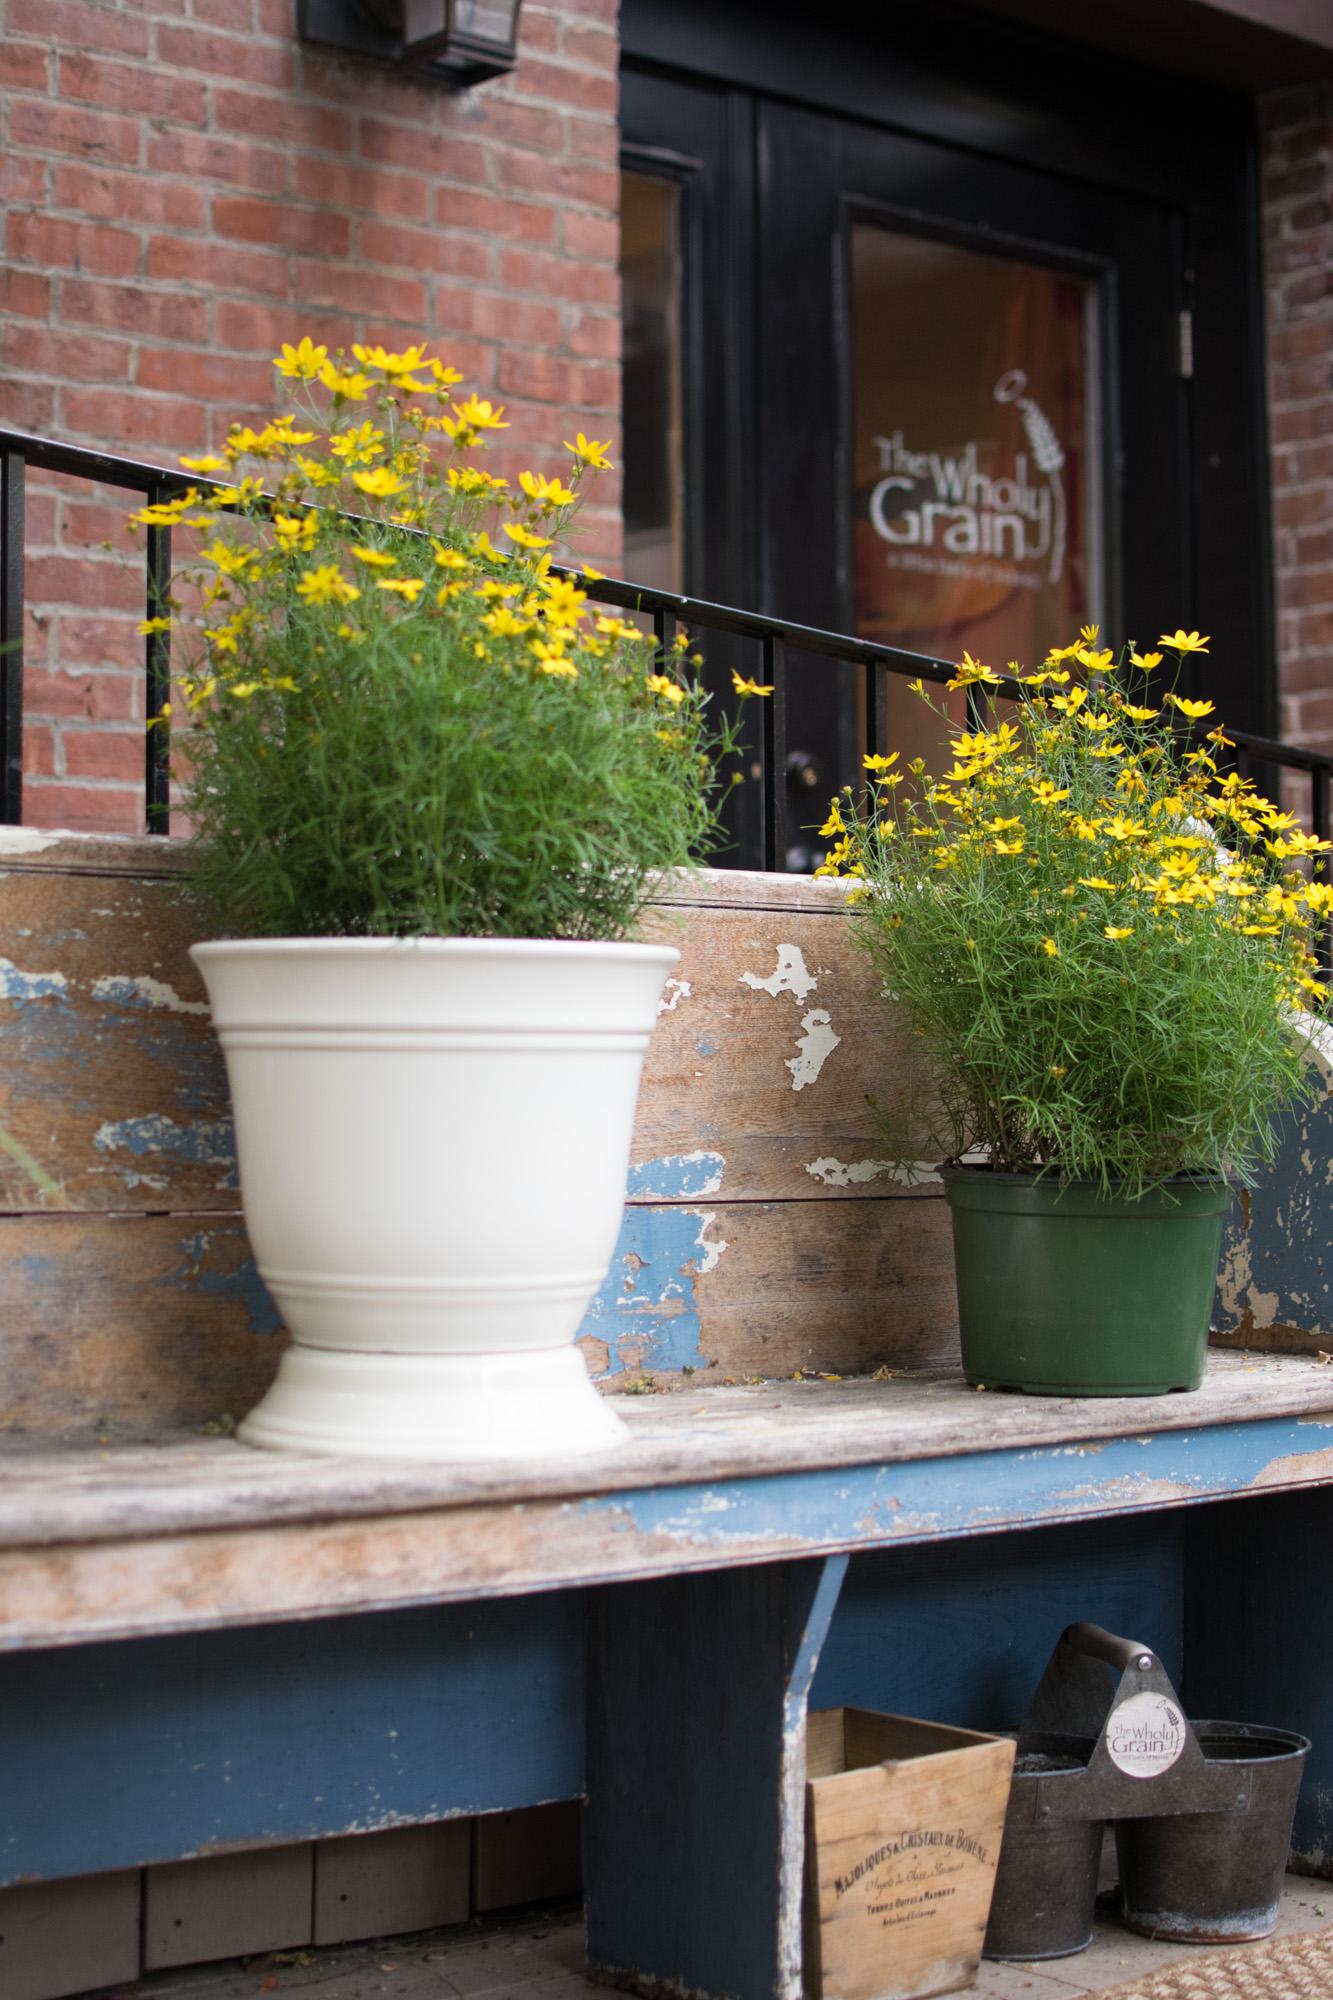 the wholy grain, boston cafés, the-alyst.com